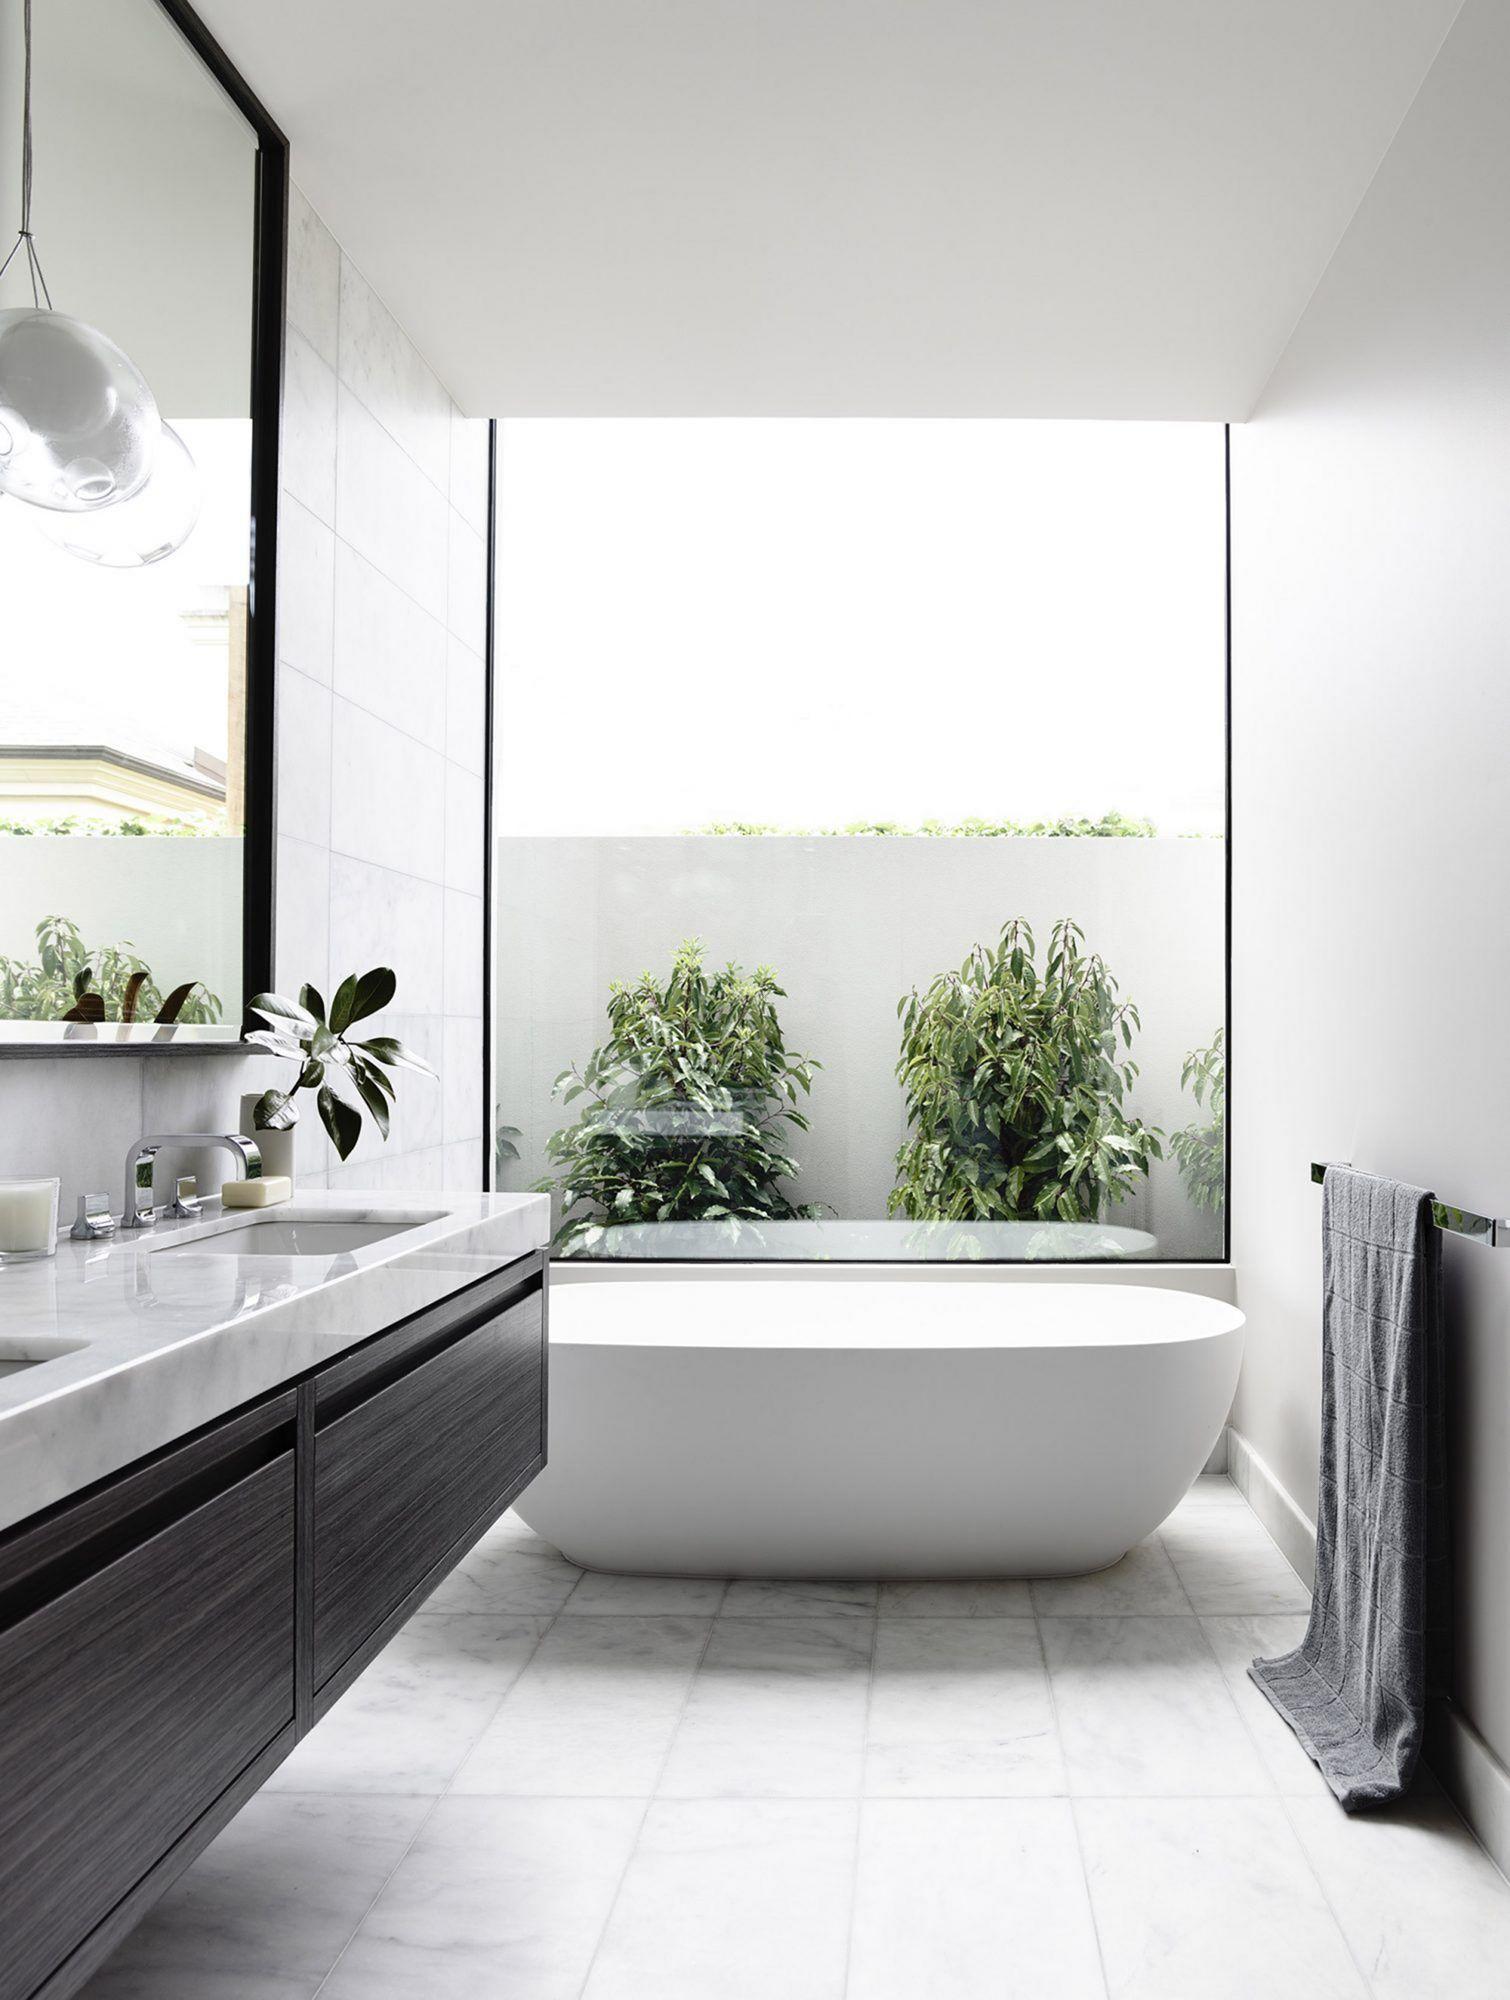 Amazing 39 Modern Bathroom Design Trends For Your Dream House Http Gurudecor Com Modern Contemporary Bathrooms Bathroom Design Trends Contemporary Bathrooms